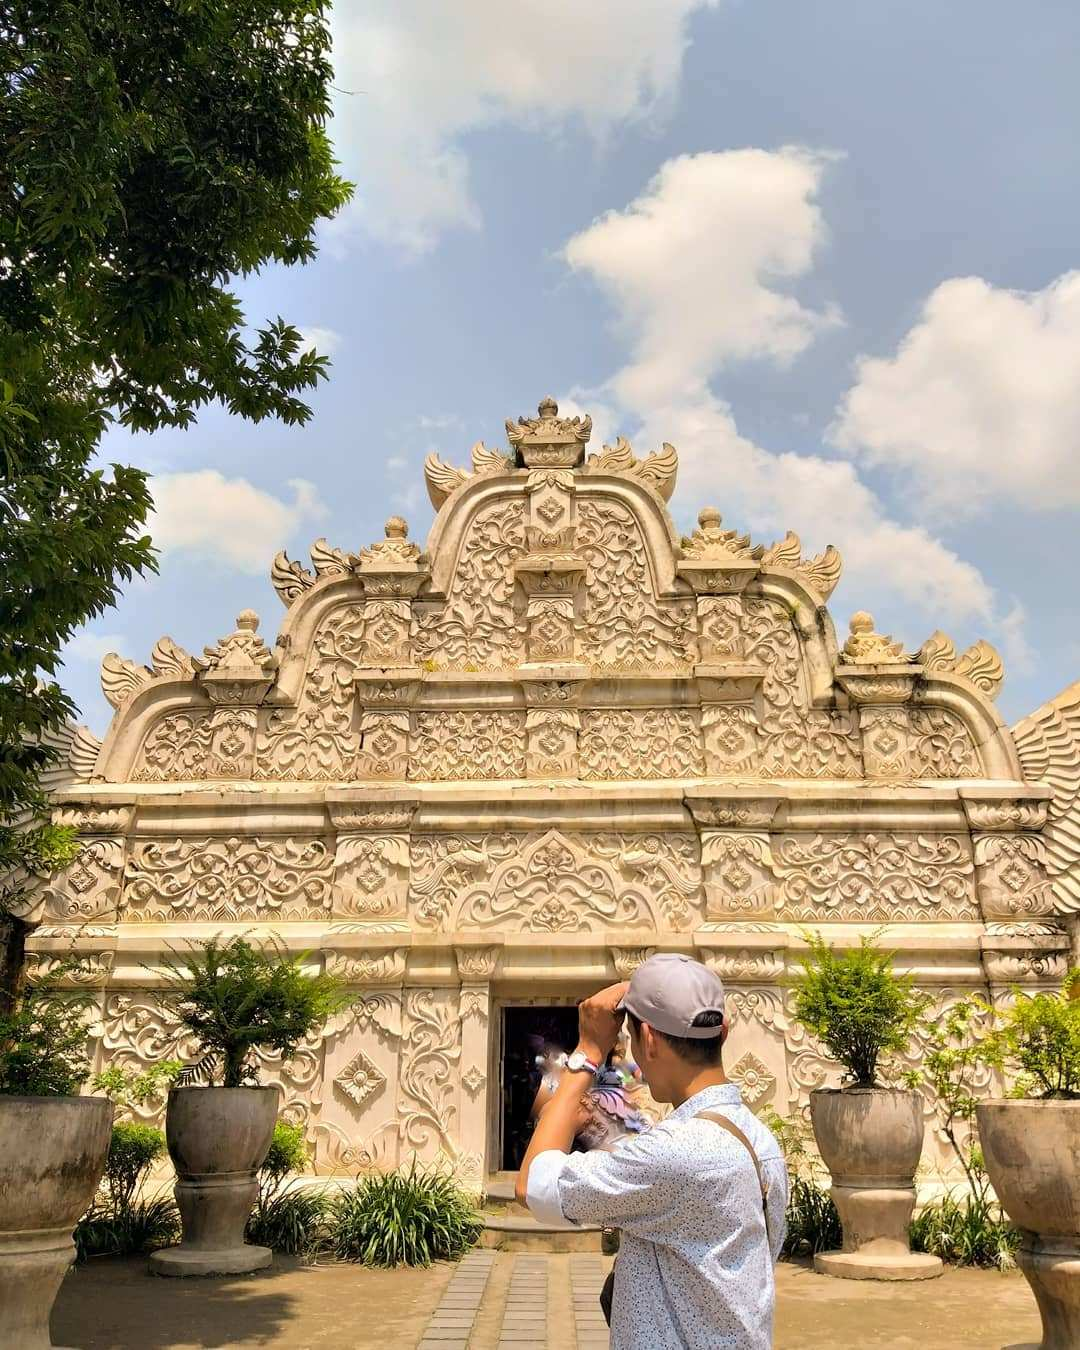 Gapura Agung Taman Sari Jogja Image From @narfn